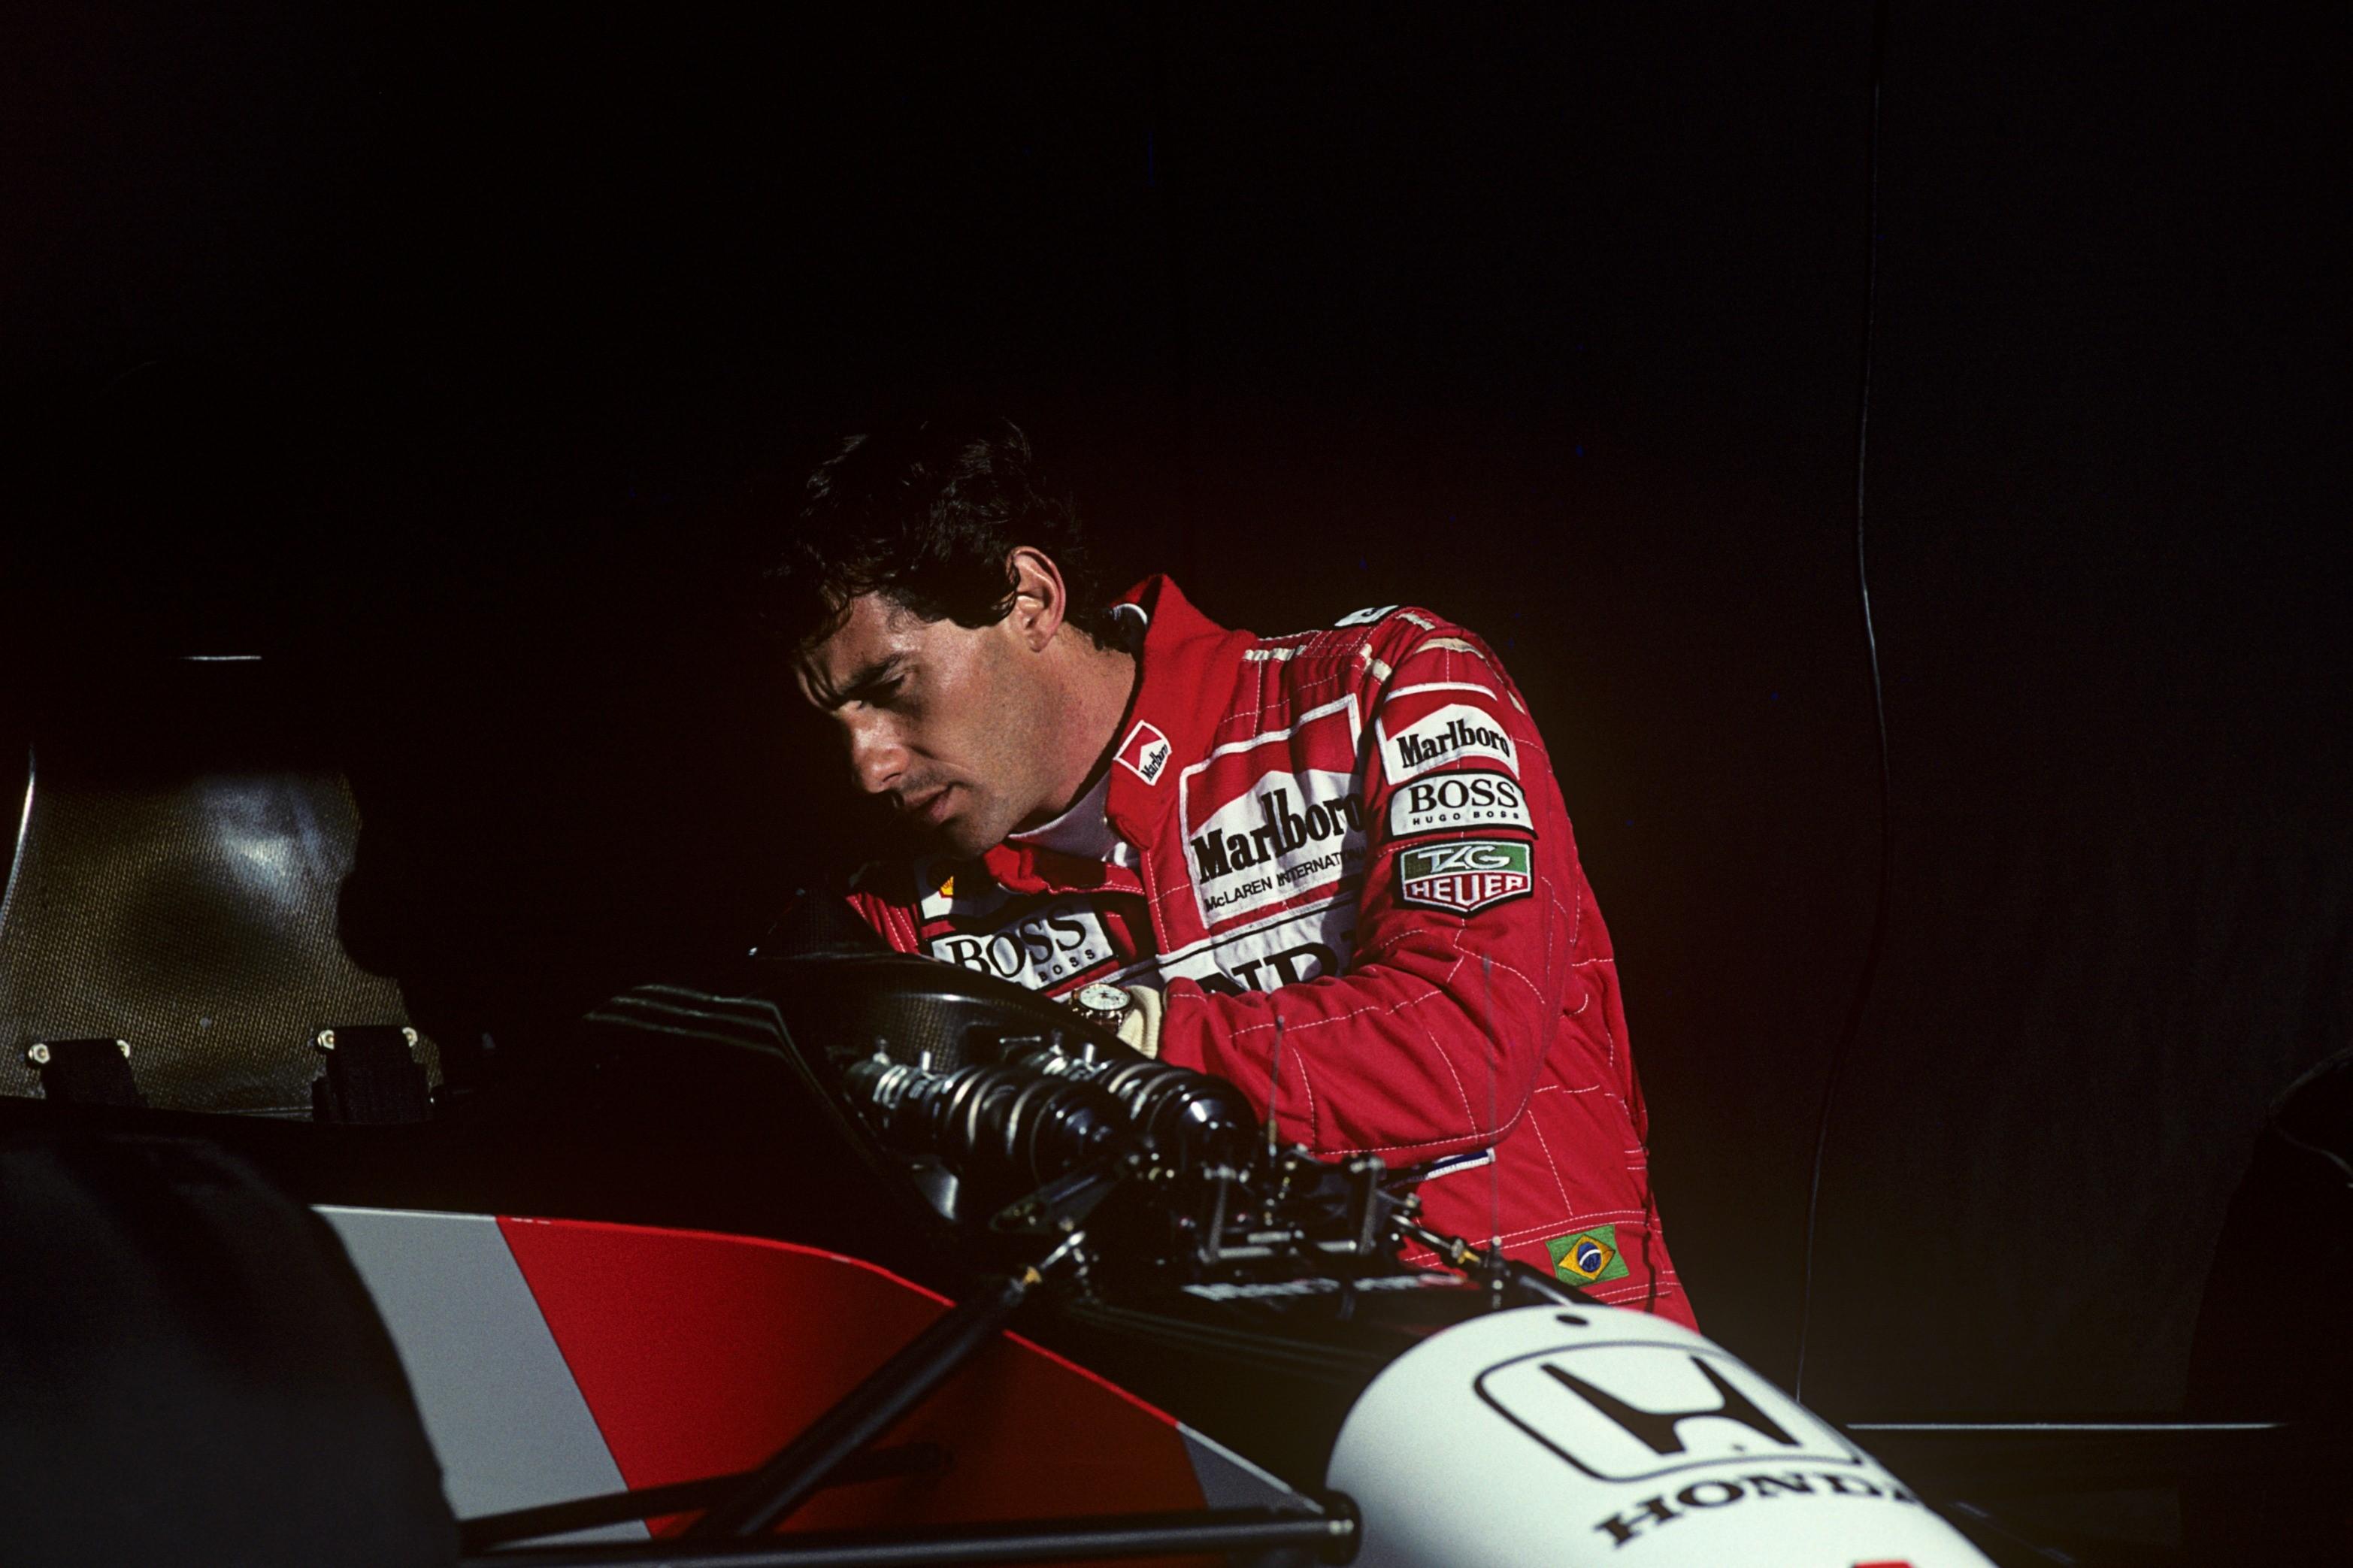 Ayrton Senna (McLaren) au Grand Prix du Portugal 1992